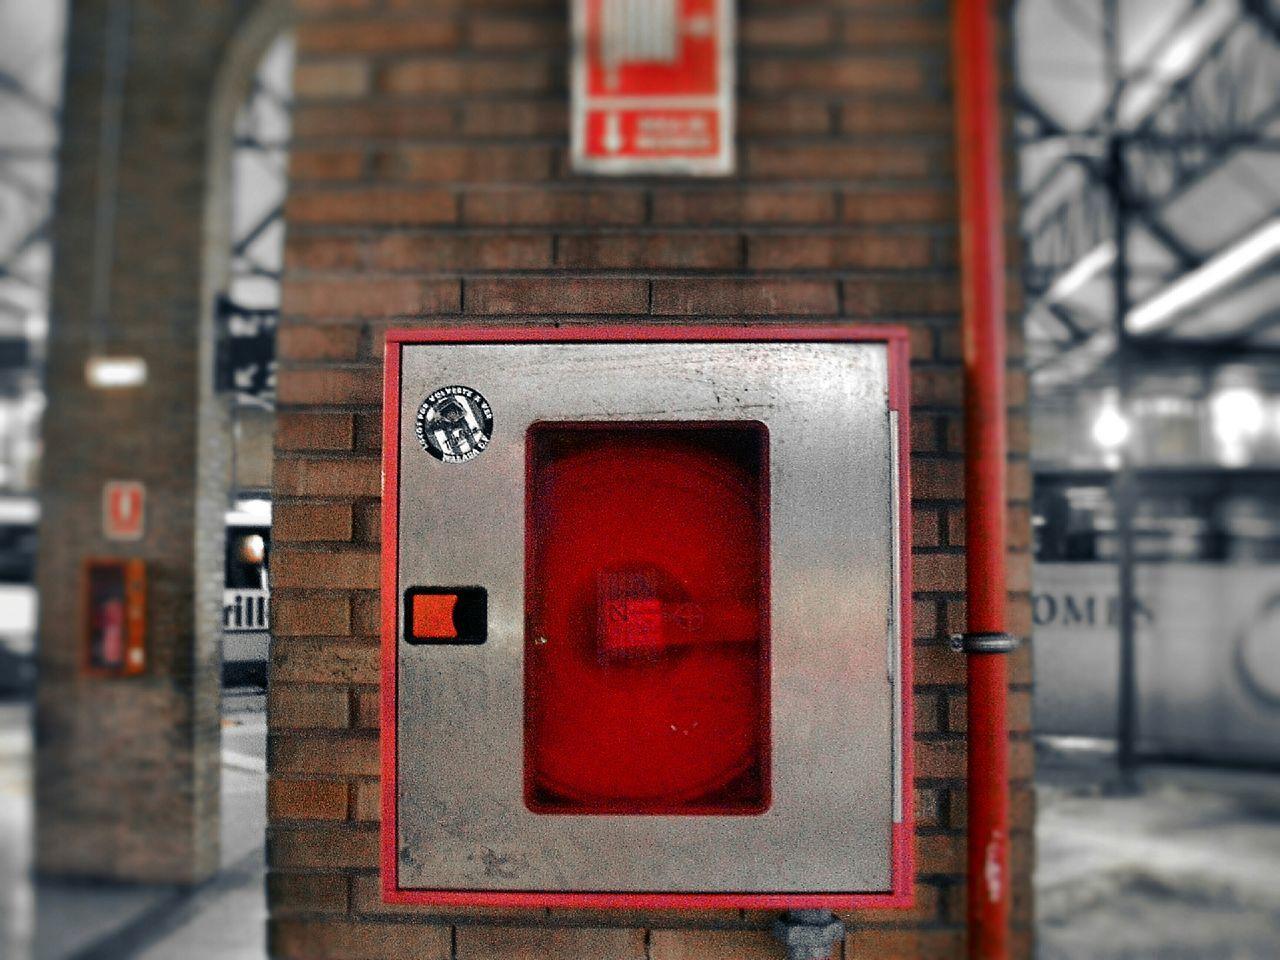 Malaga Spain, Andalucia, Malaga Street Photography Bus Station Red Urban Fire Hydrant